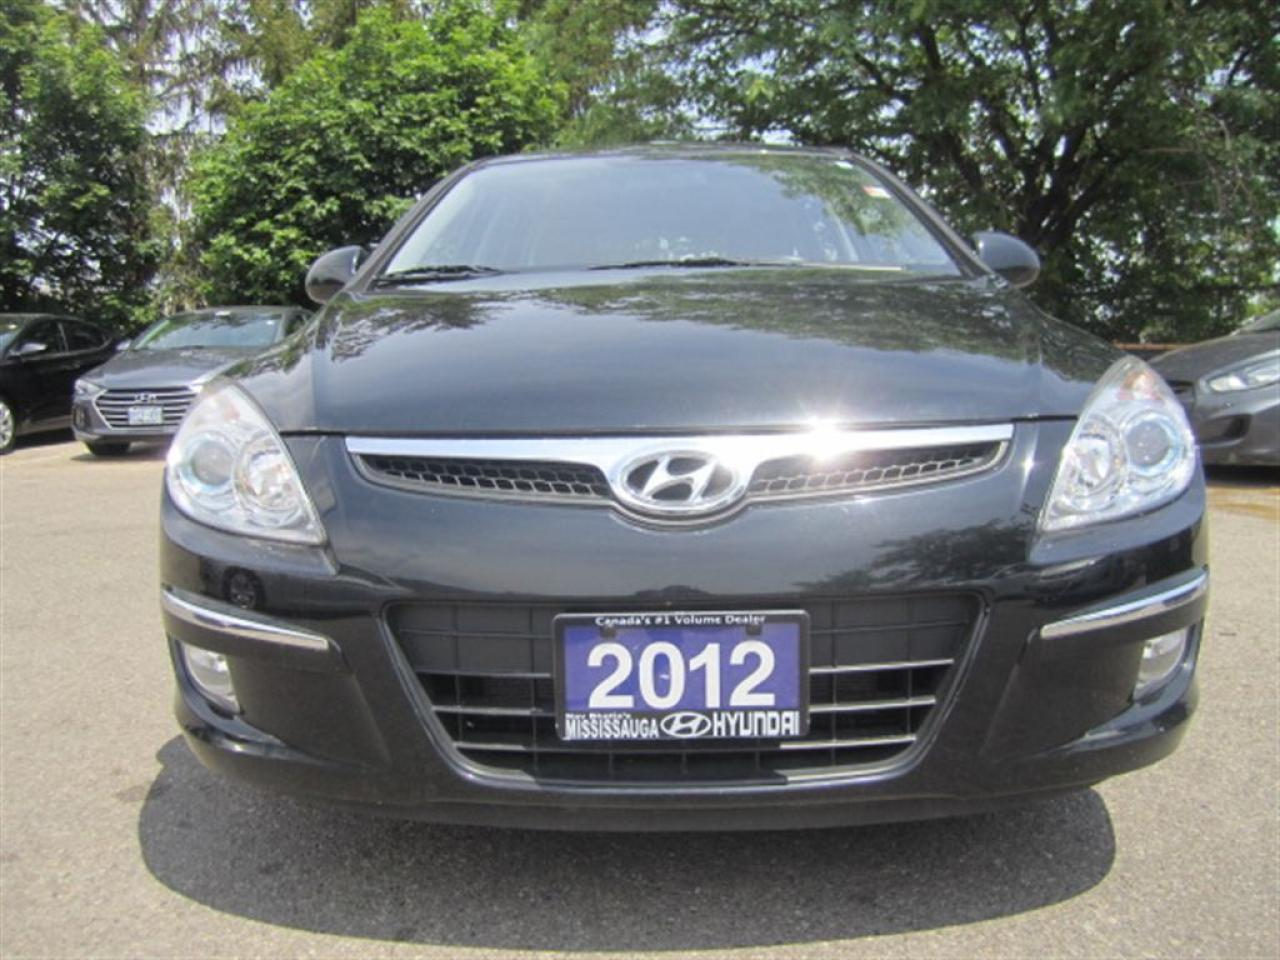 2012 Hyundai Elantra Touring GLS Sport-Sunroof-Alloys-MINT